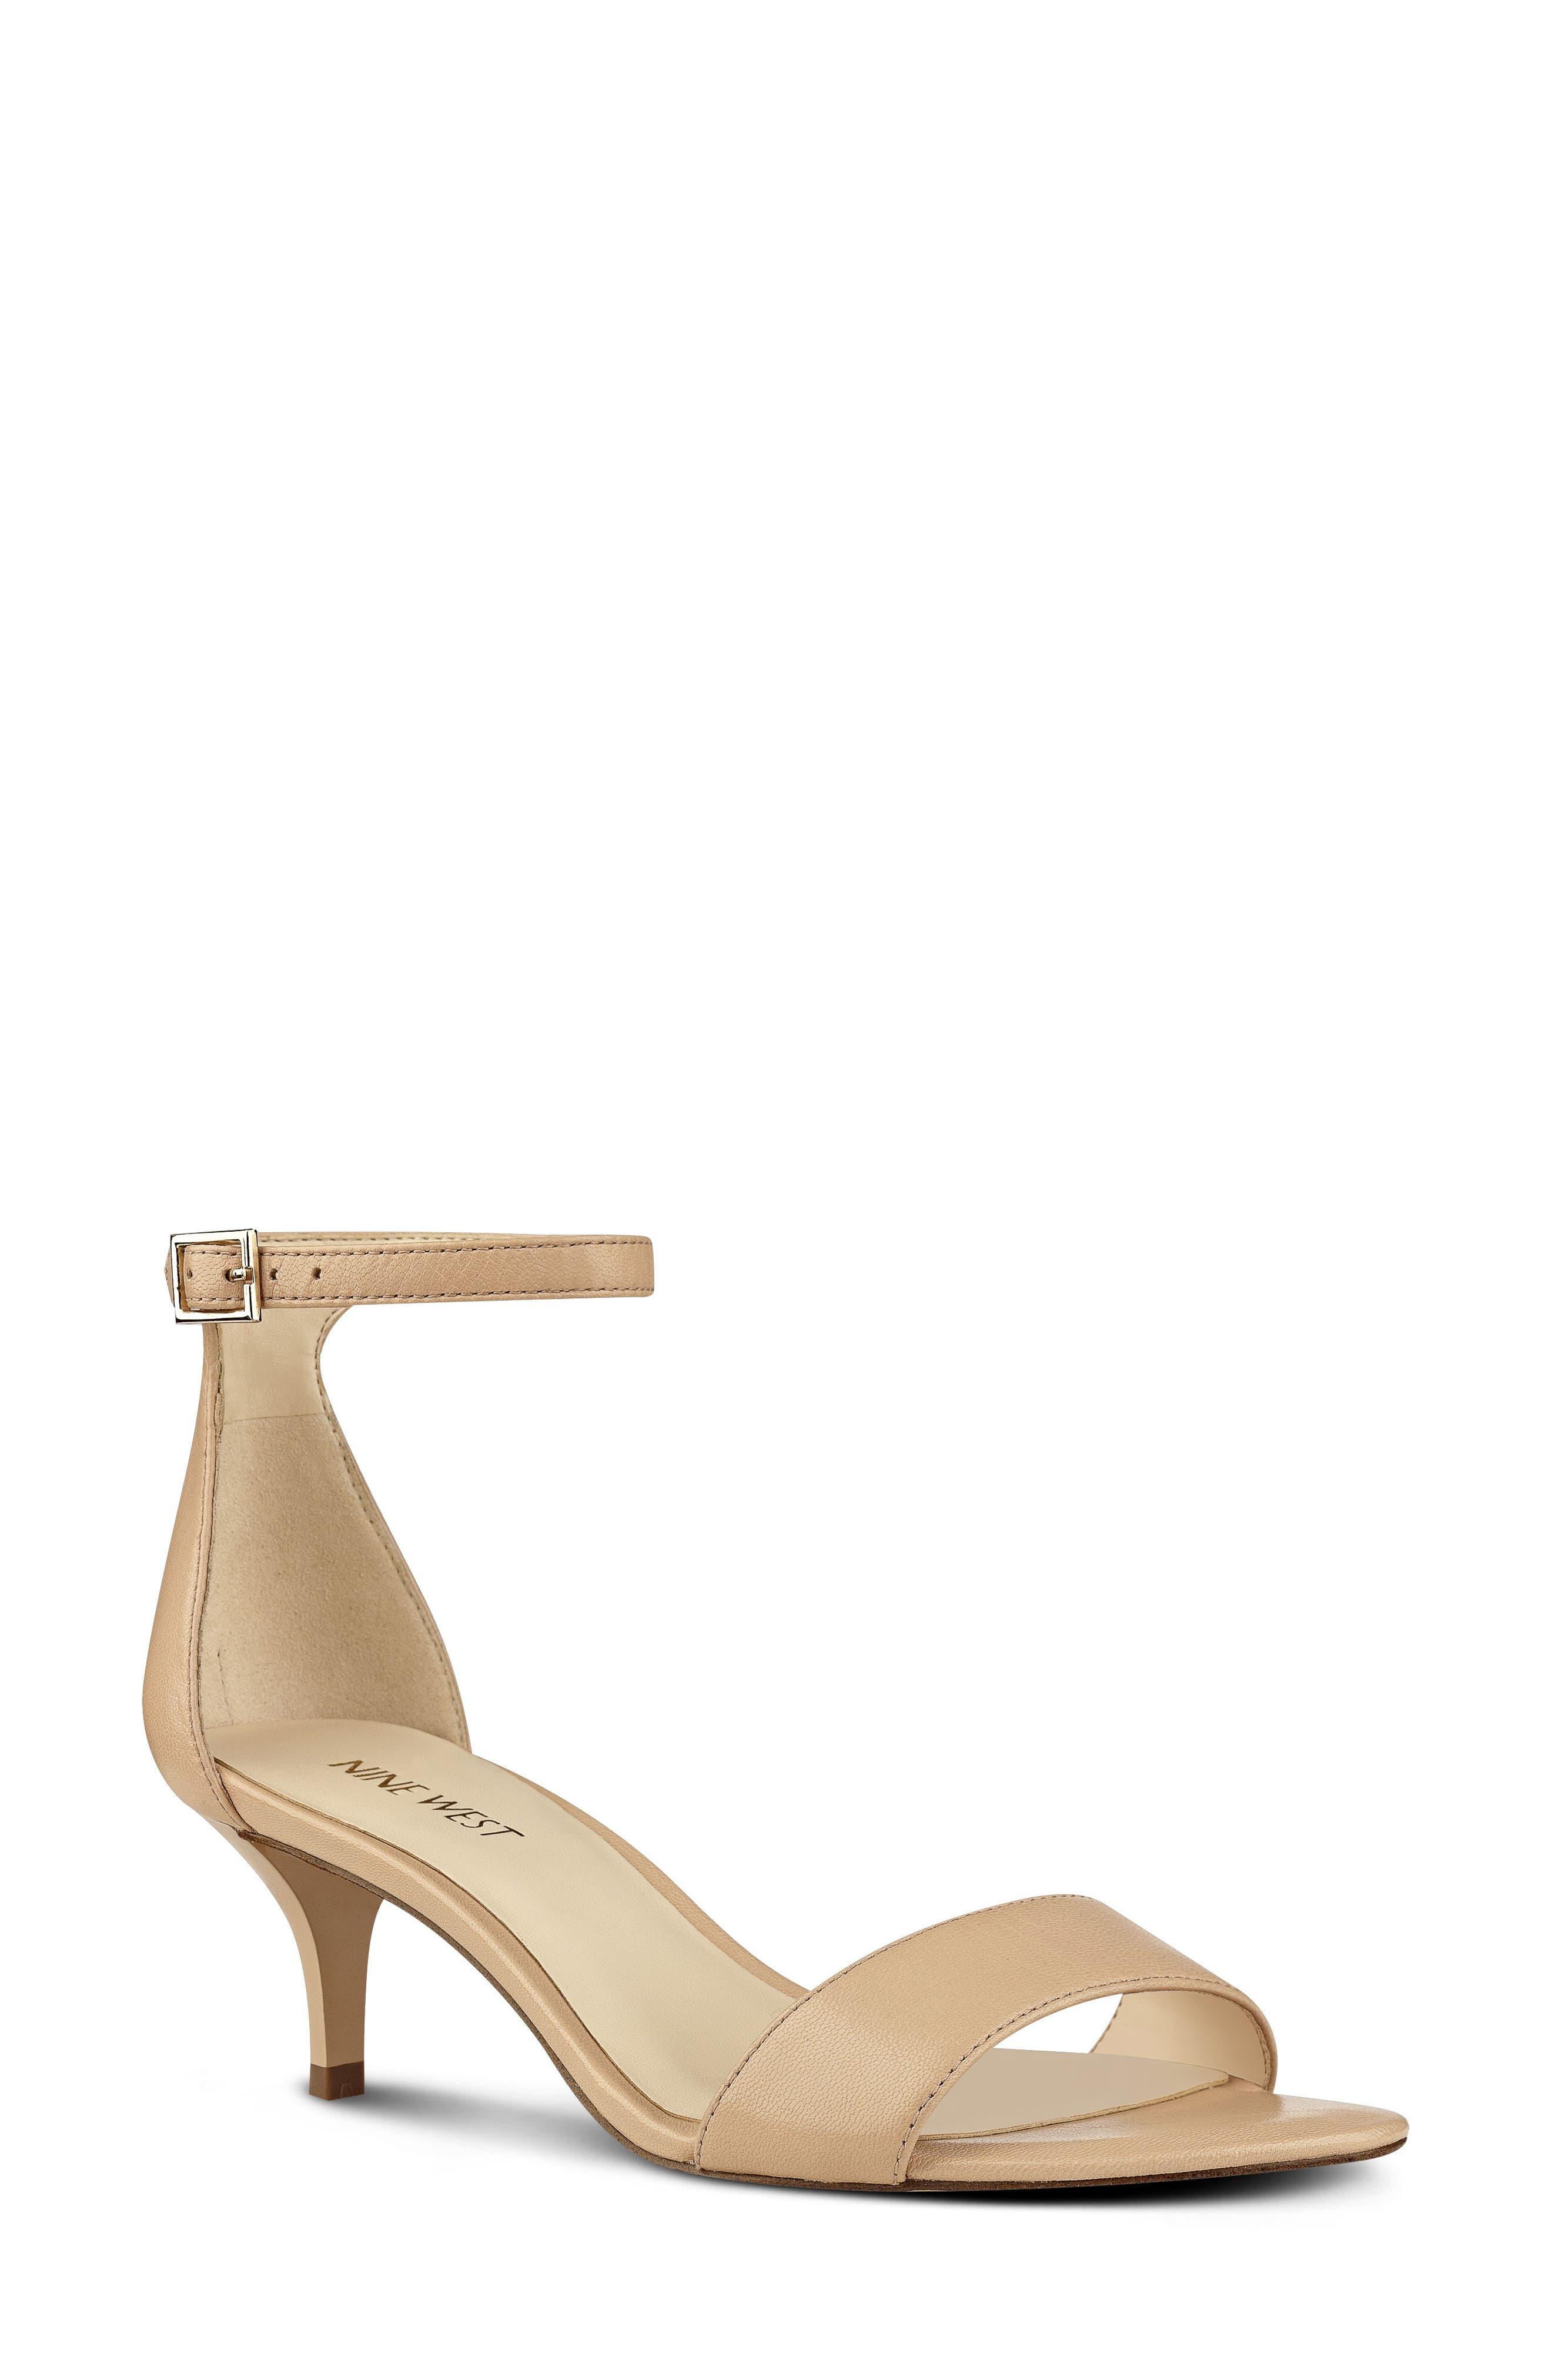 Alternate Image 1 Selected - Nine West 'Leisa' Ankle Strap Sandal (Women)